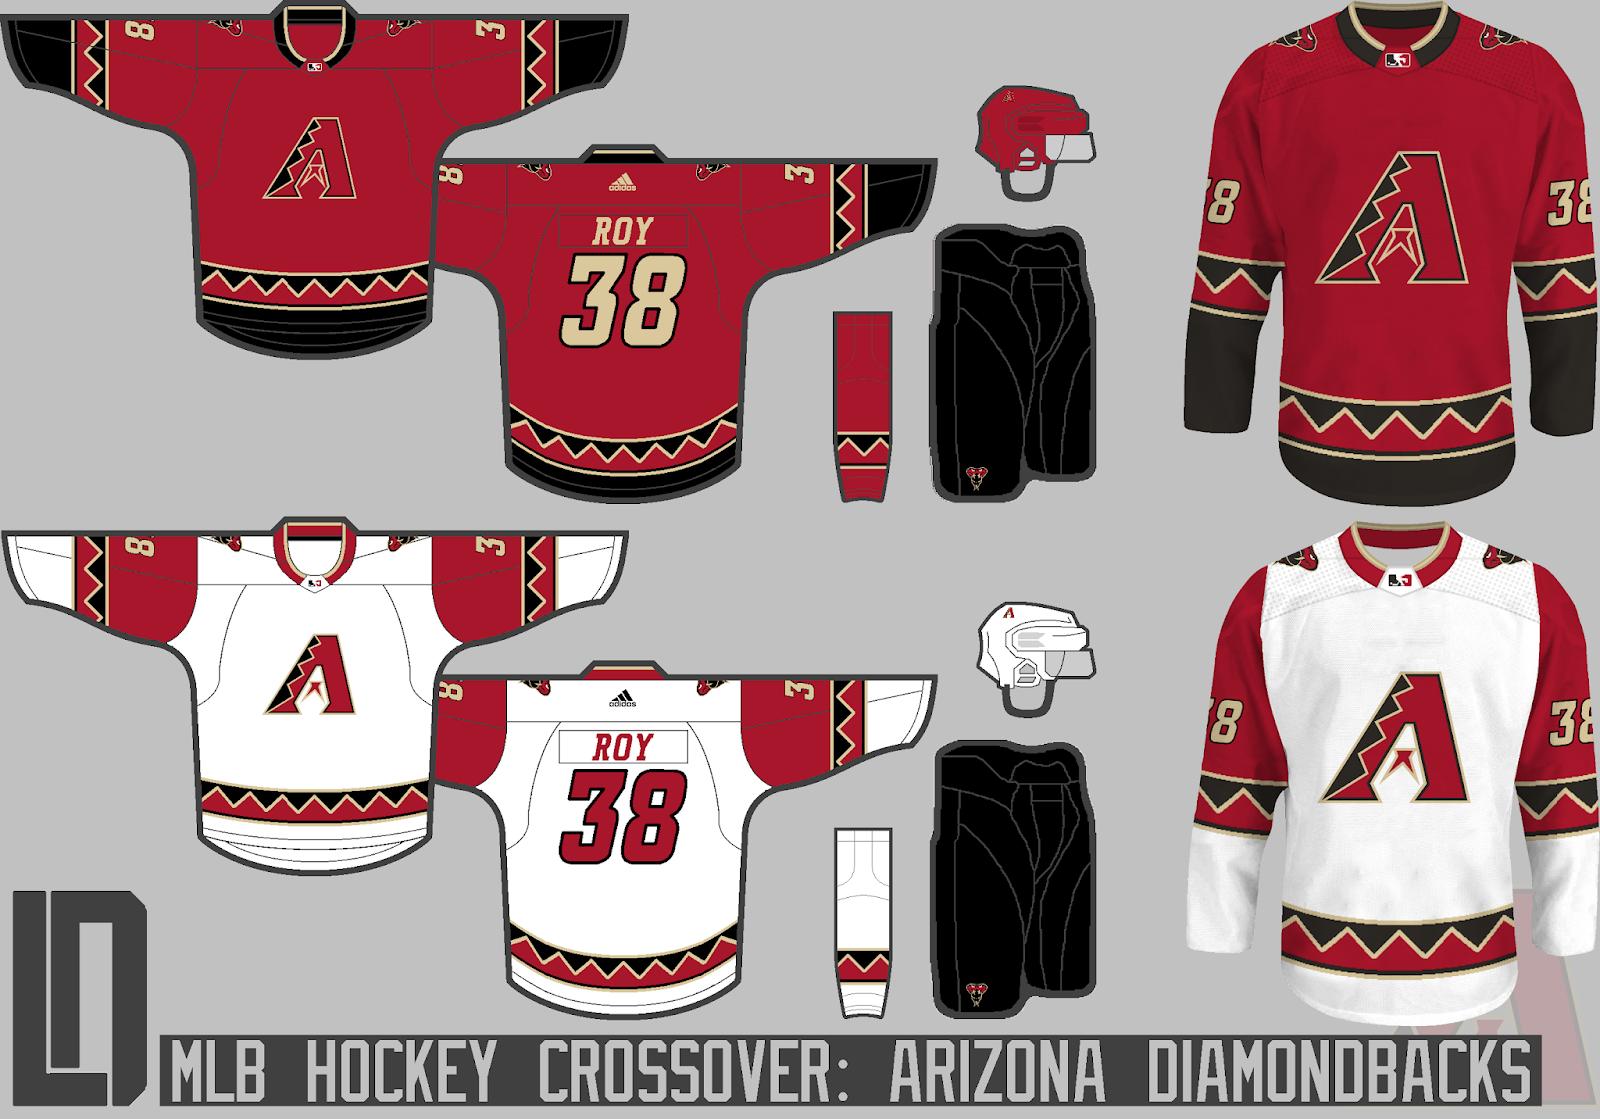 Arizona+Diamondbacks+Concept.png